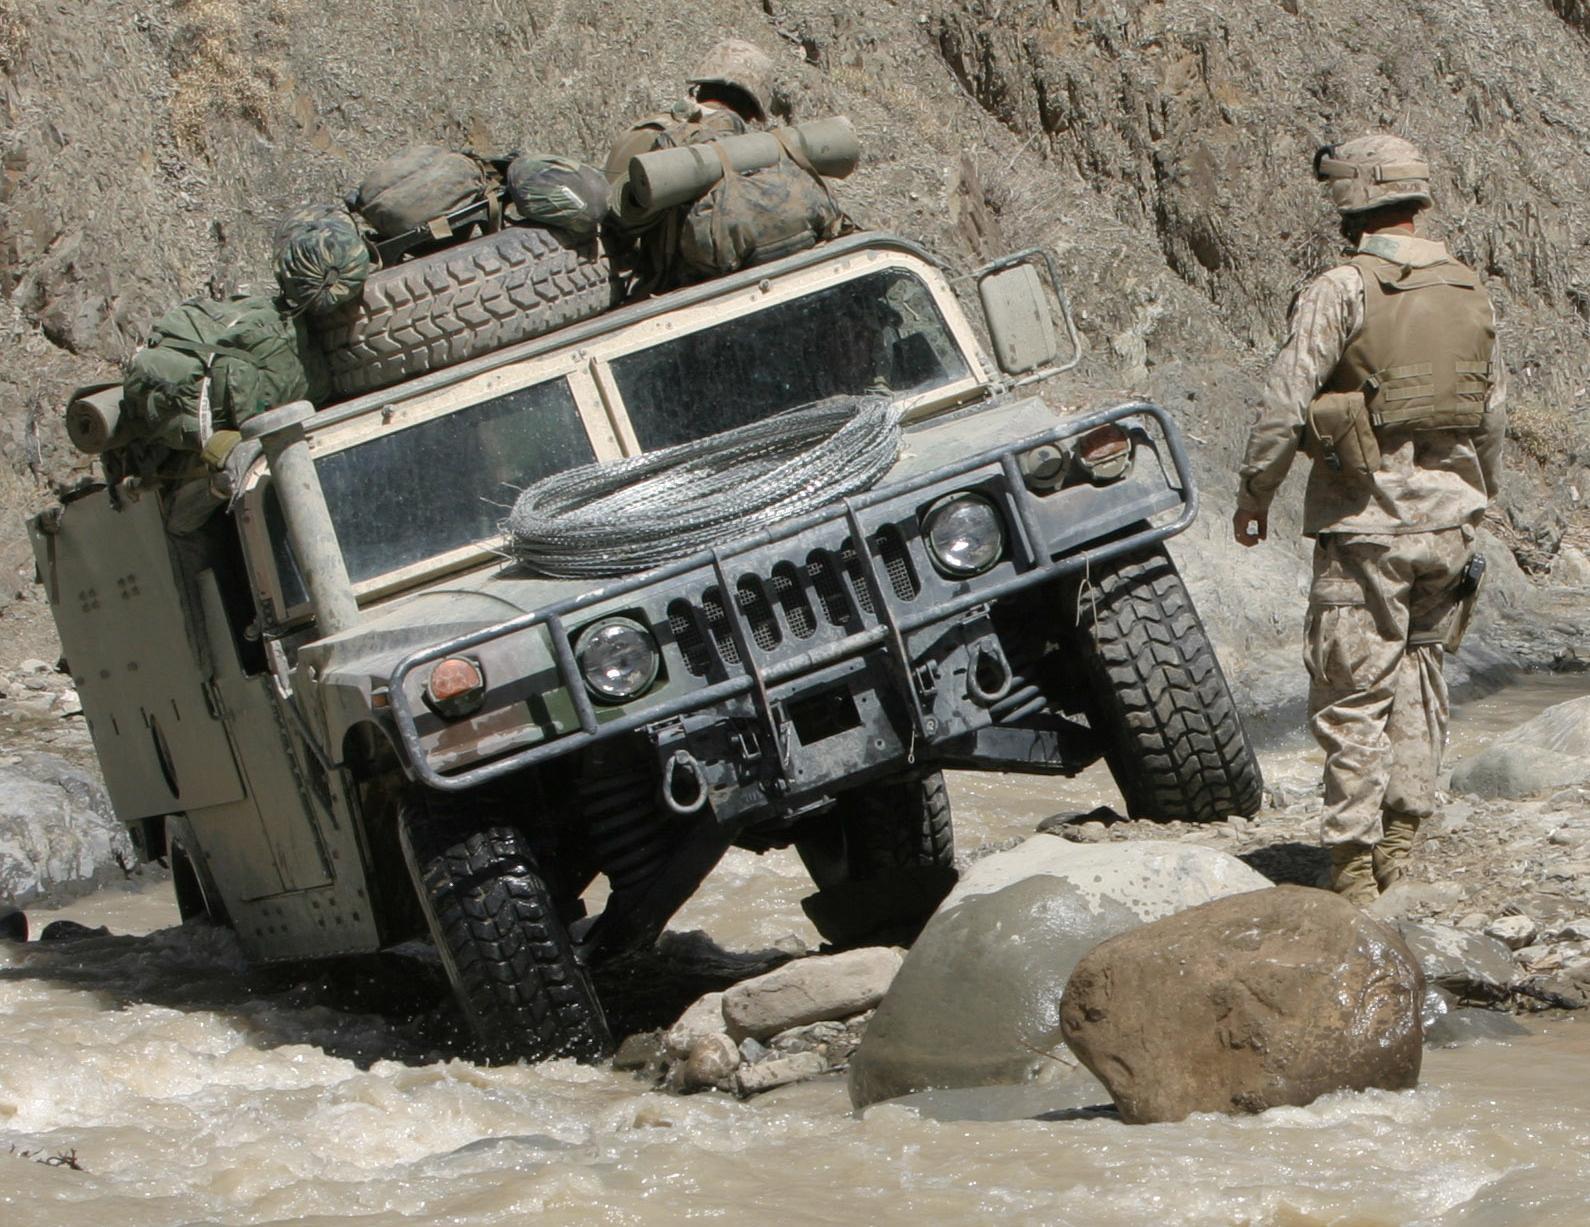 Depiction of Humvee